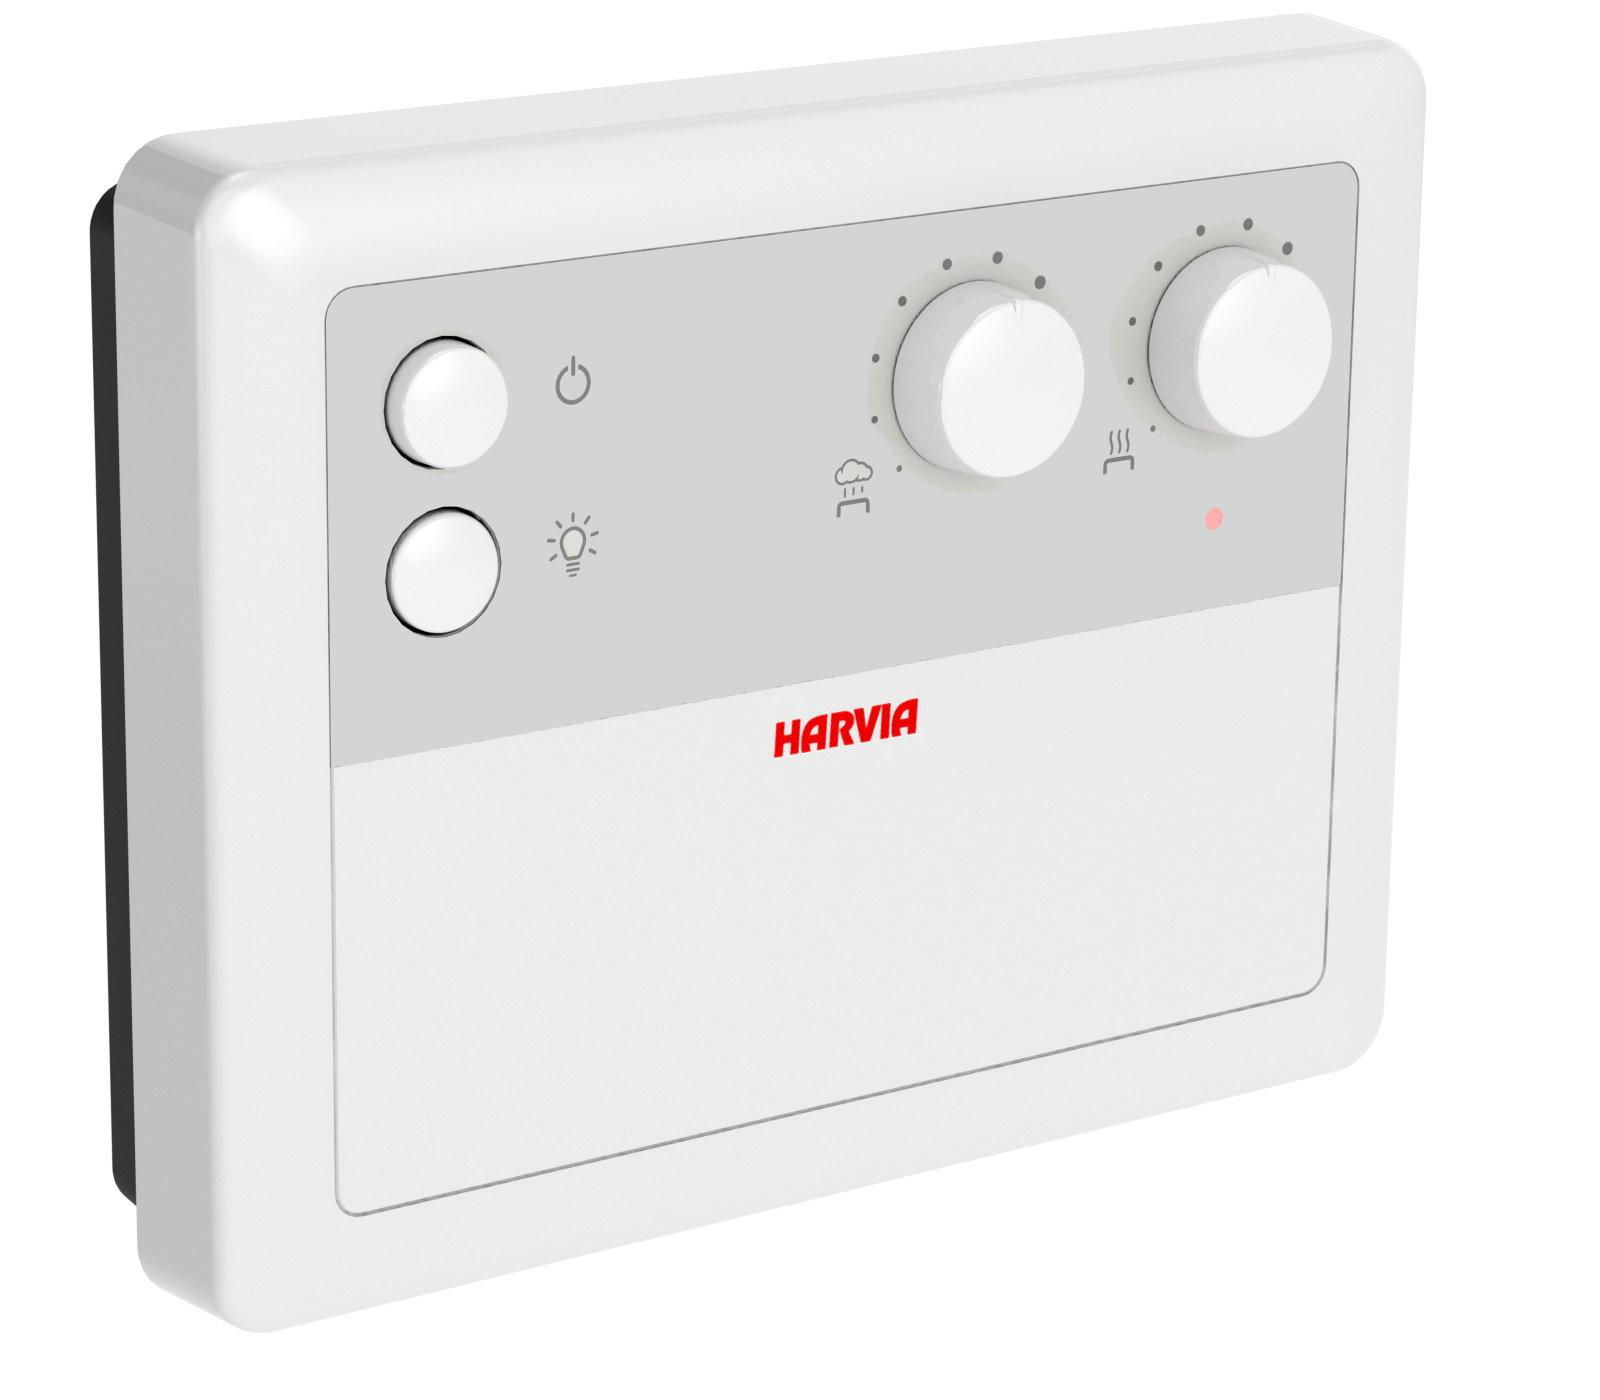 Saunasteuerung HARVIA SENLOG CF9